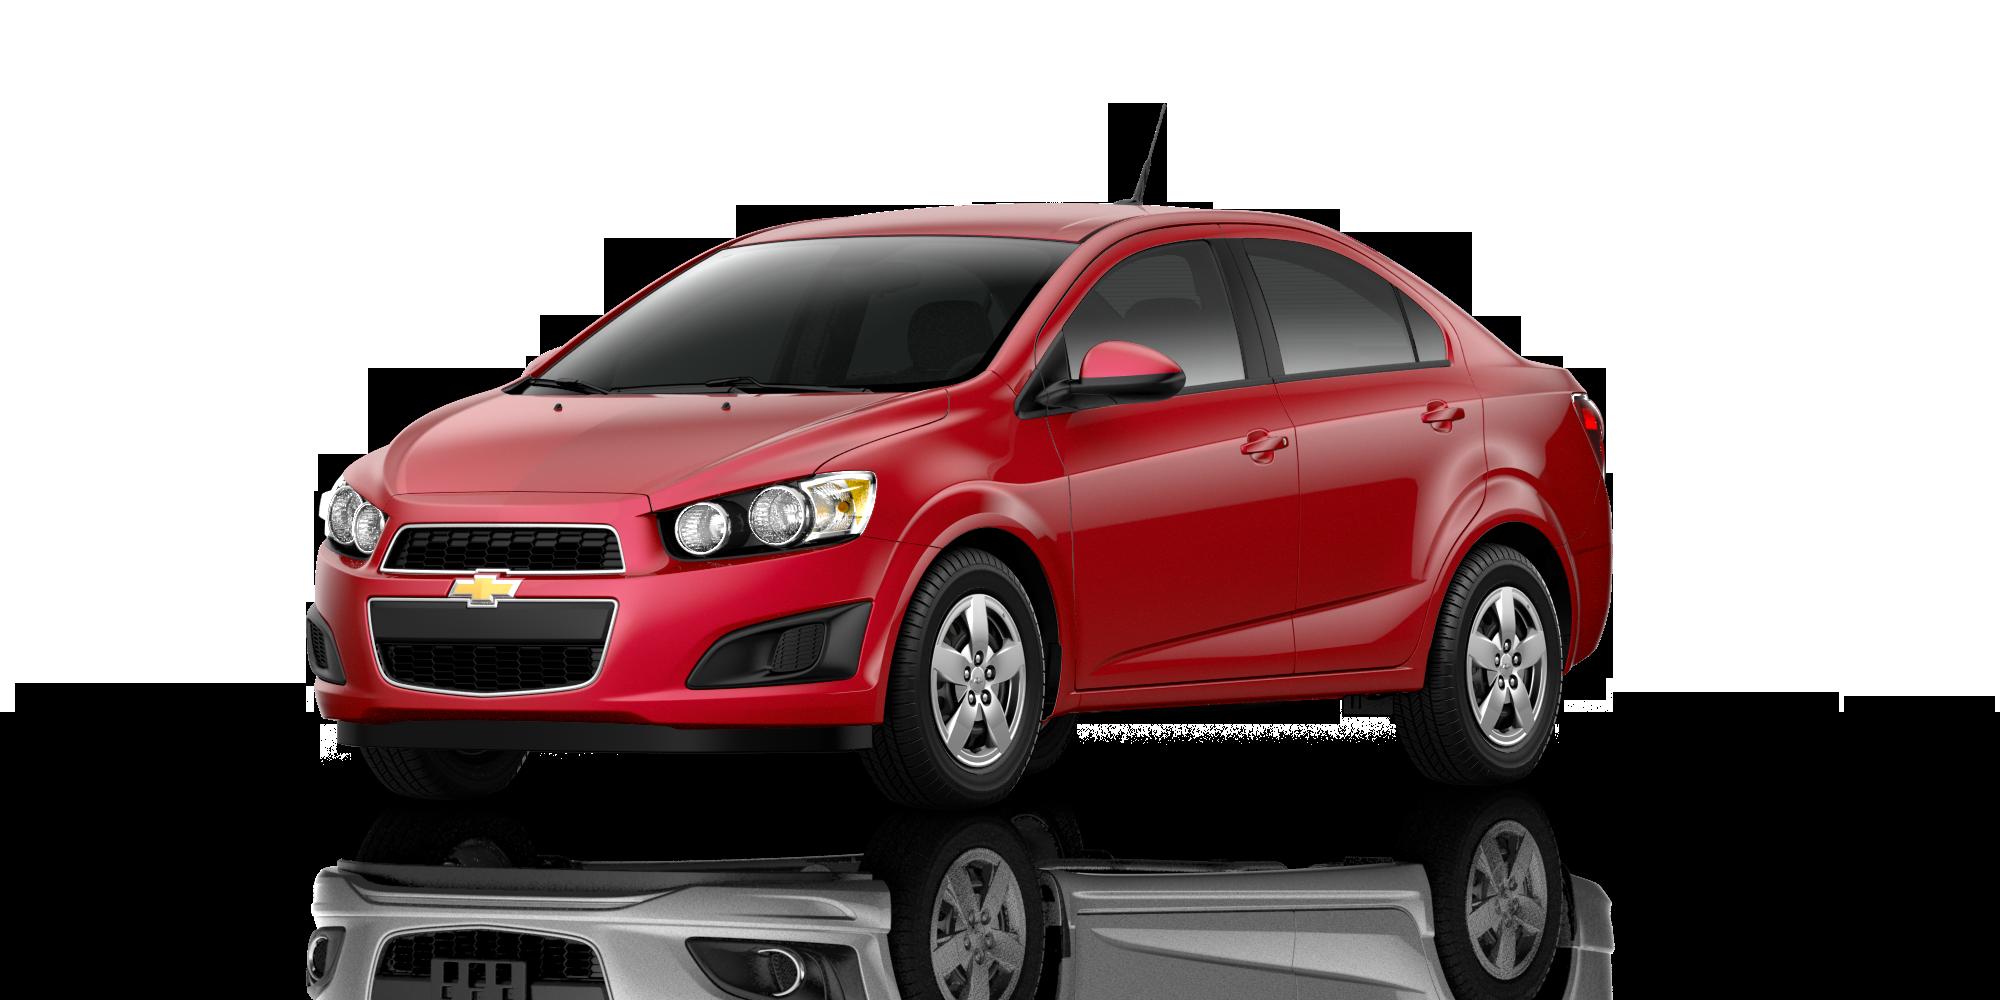 Gillman Subaru North >> Gillman Automotive Group   New Subaru, Nissan, Mitsubishi, Honda, Acura, Chevrolet, Buick, GMC ...